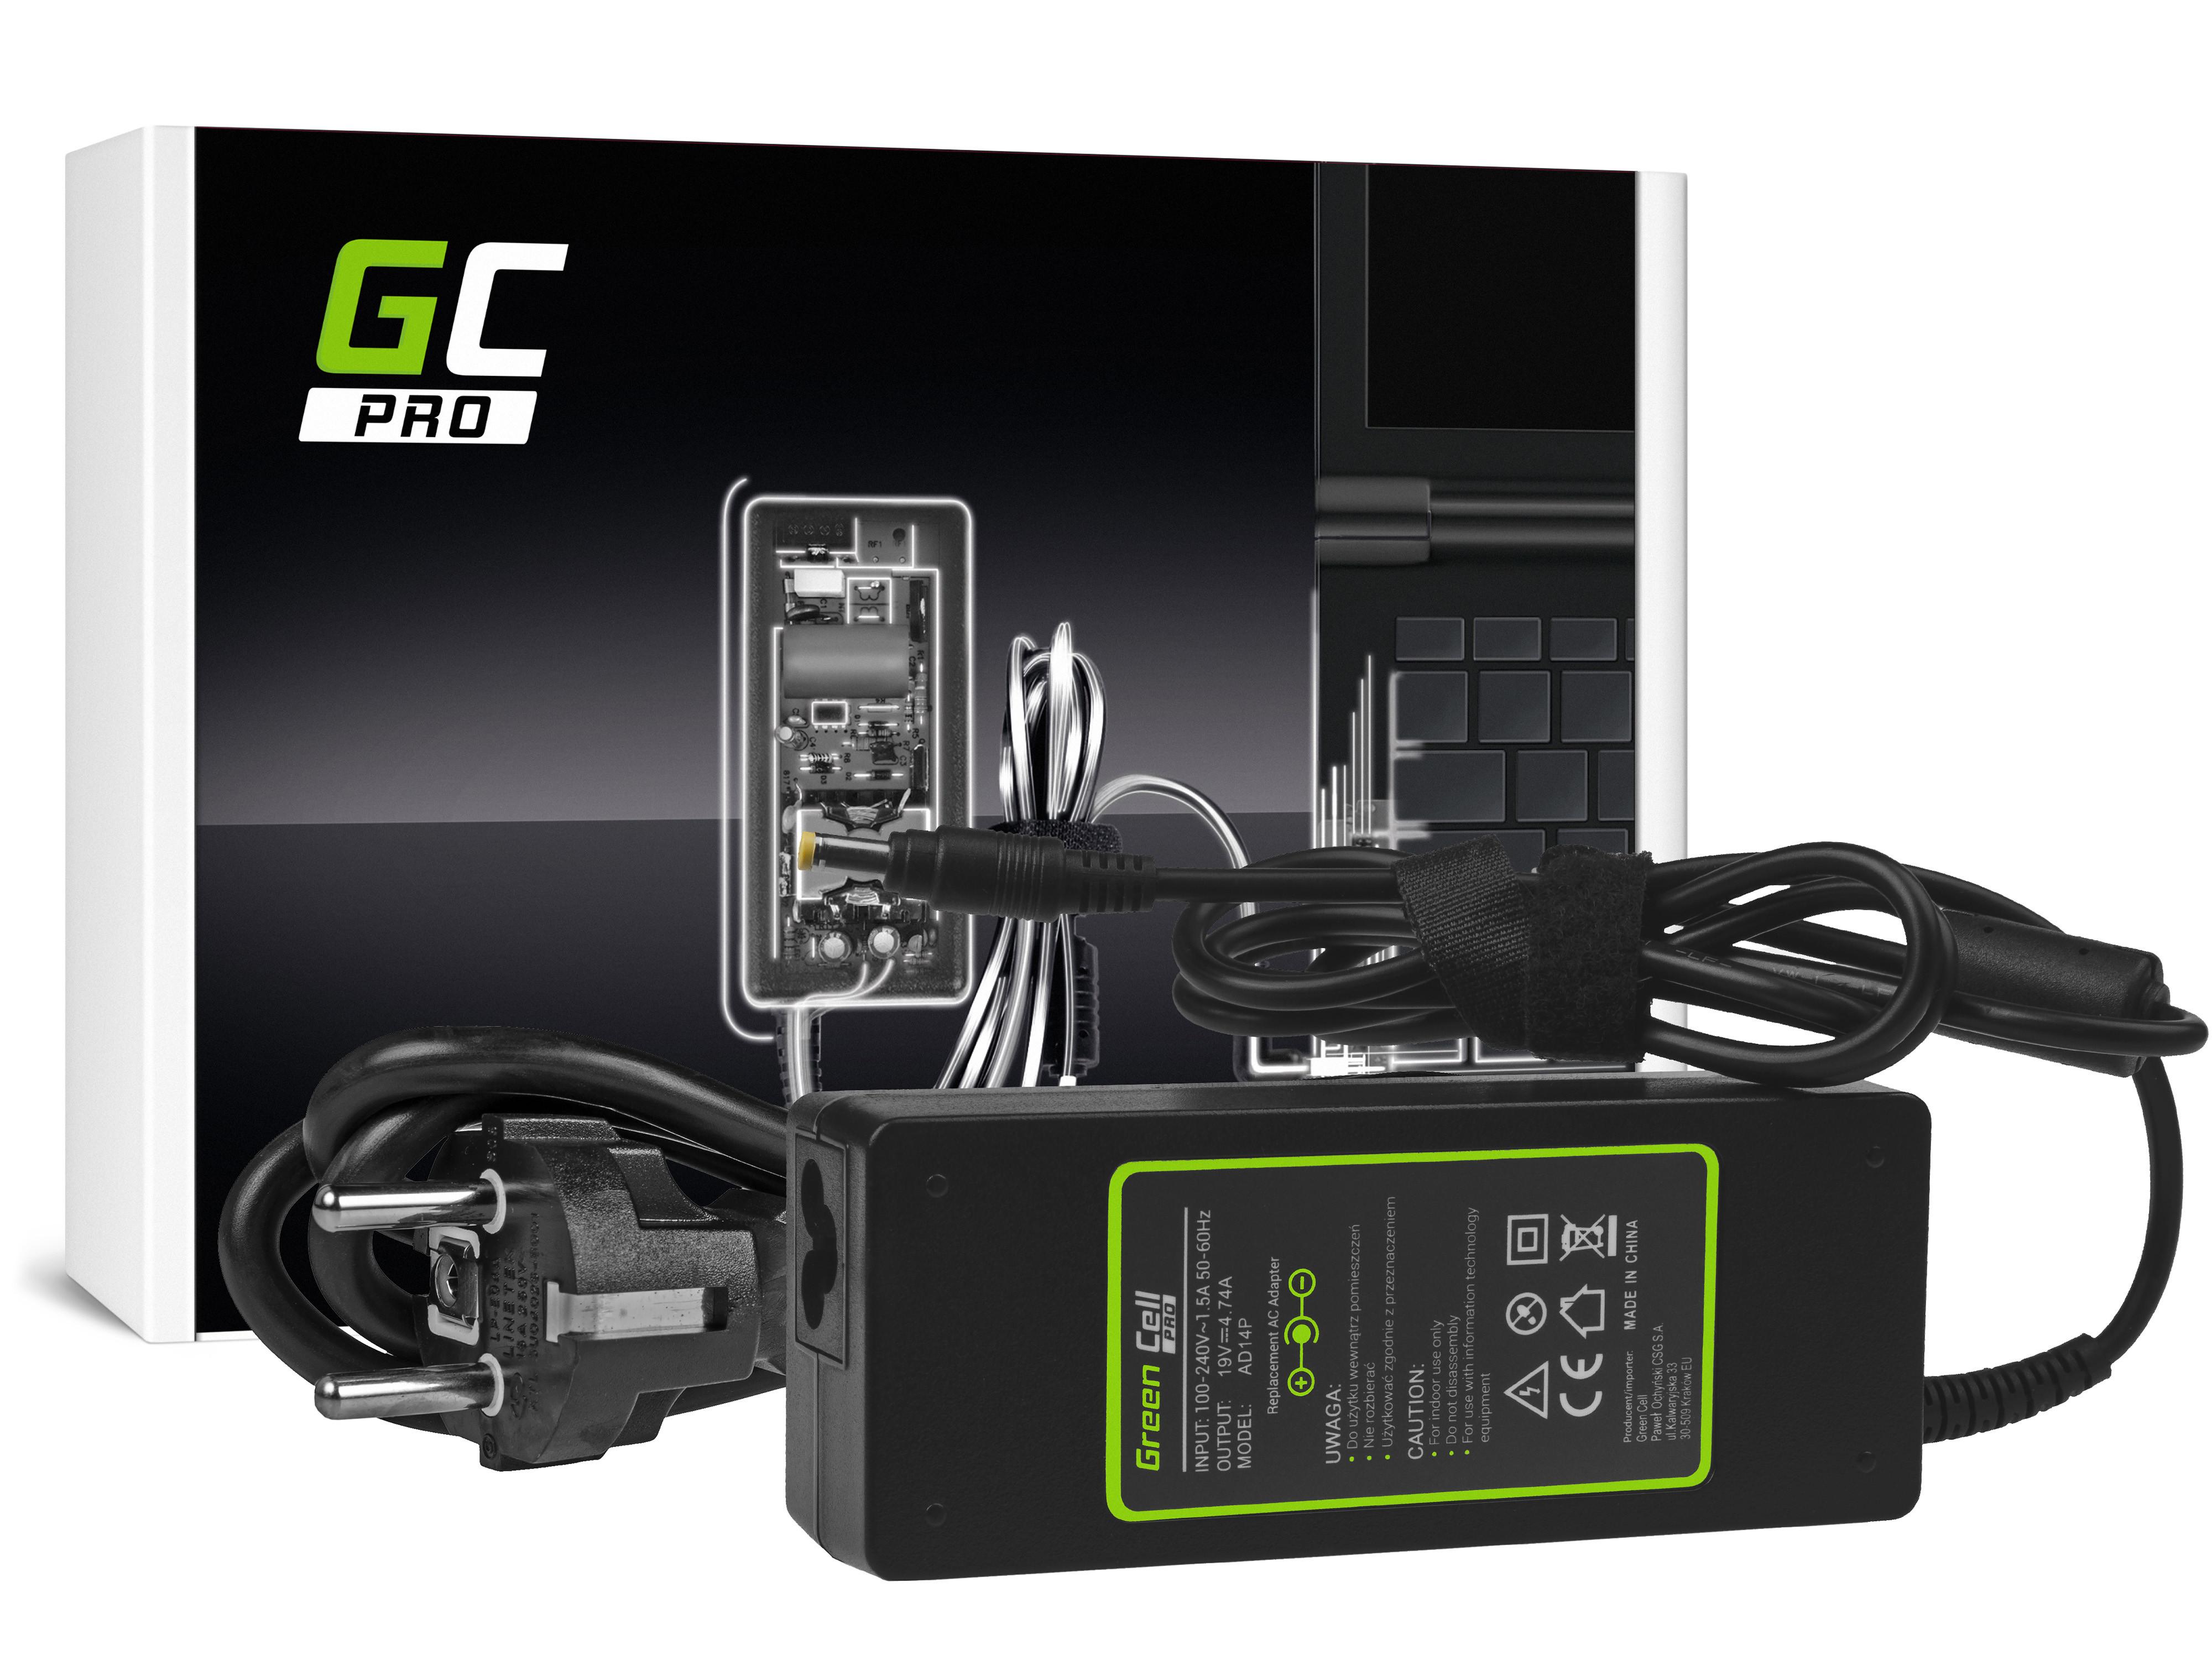 Green Cell AD14P Adaptér Nabíječka HP Pavilion DV6500 DV6700 DV9000 DV9500 Compaq 6720s 6730b 6820s 4.74A 90W